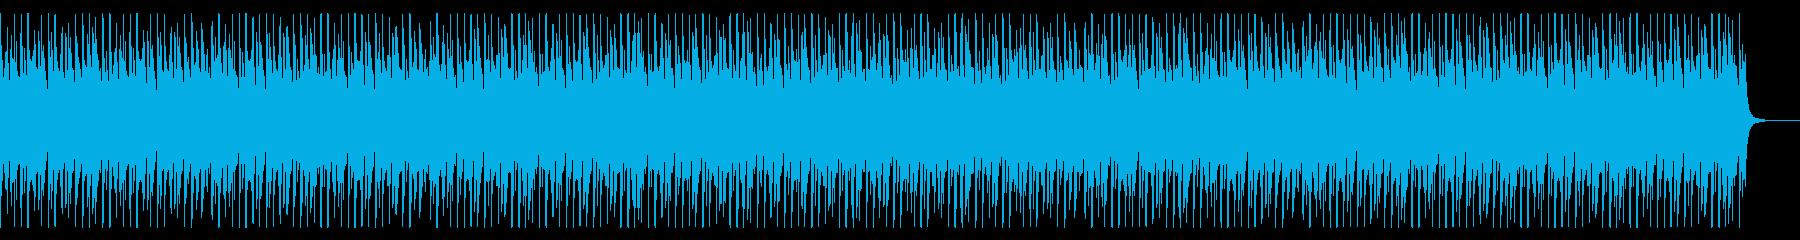 No base ver Metallophone WIND Refreshing's reproduced waveform